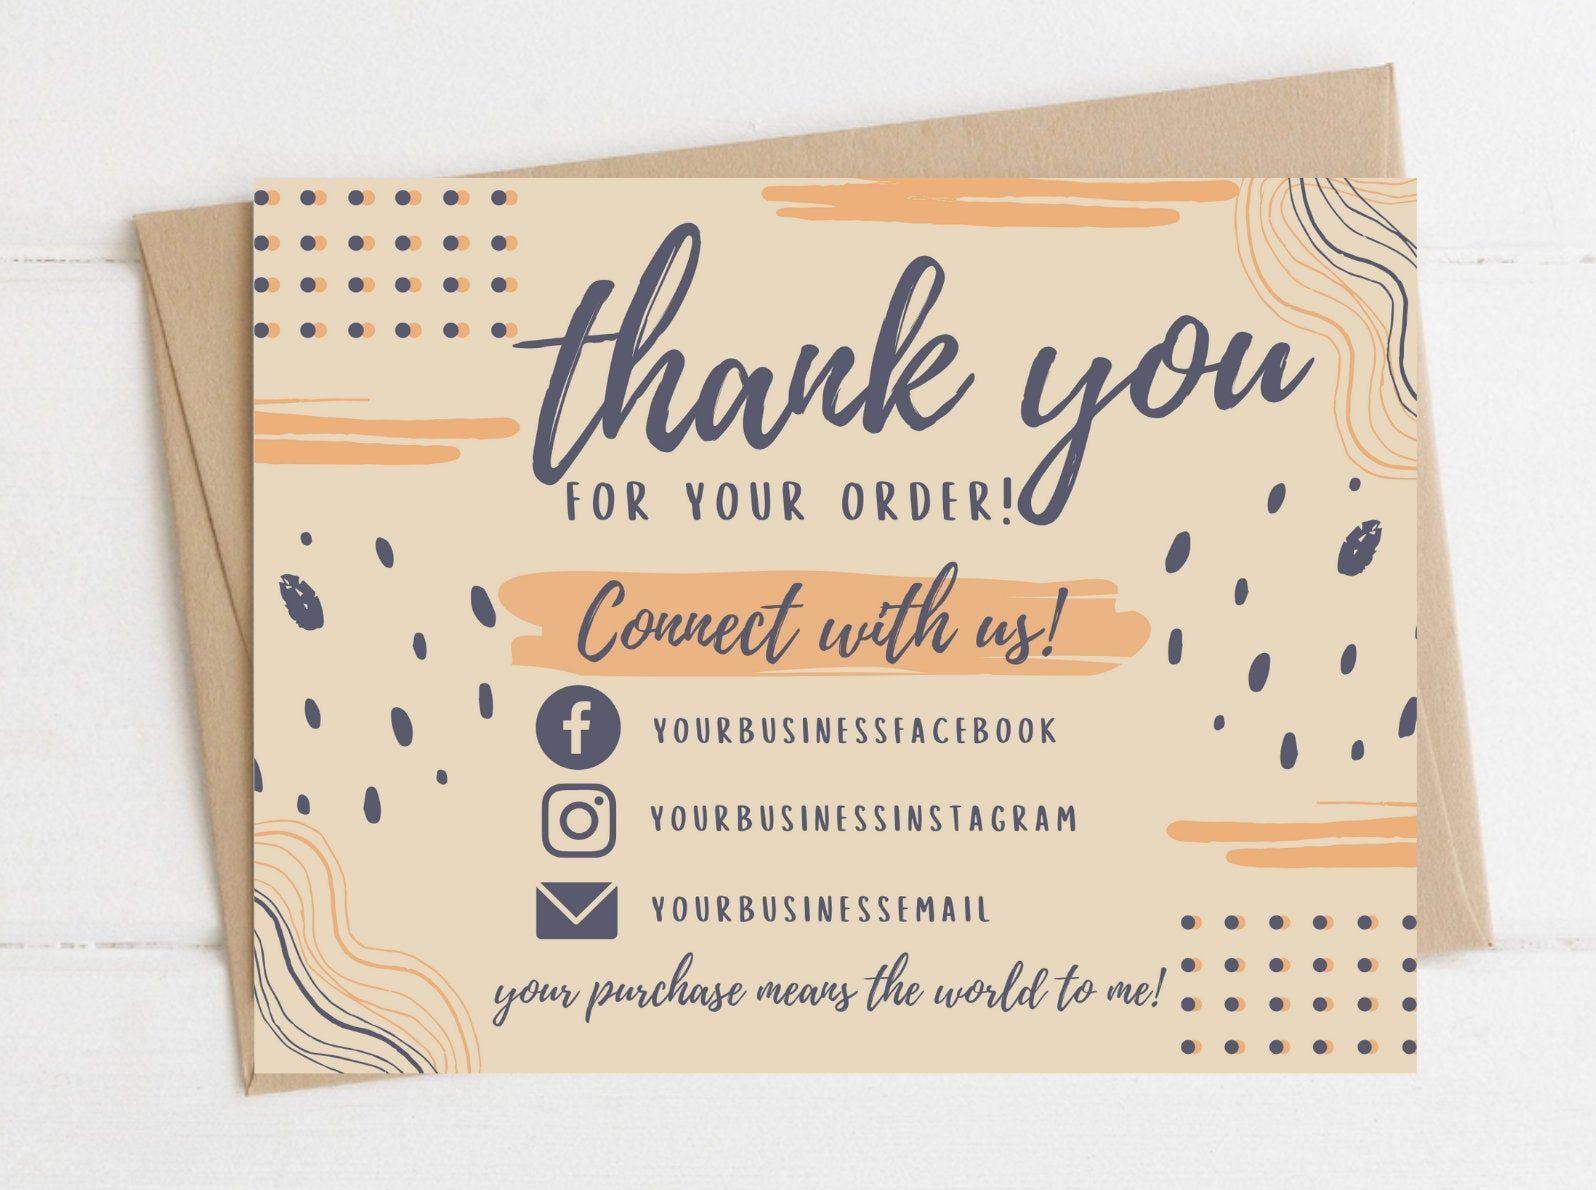 Instant Download Thank You Card Editable And Printable Thank You Cards Thank You Card For Business Personalized Thank You Di 2020 Kartu Nama Kartu Nama Bisnis Kartu